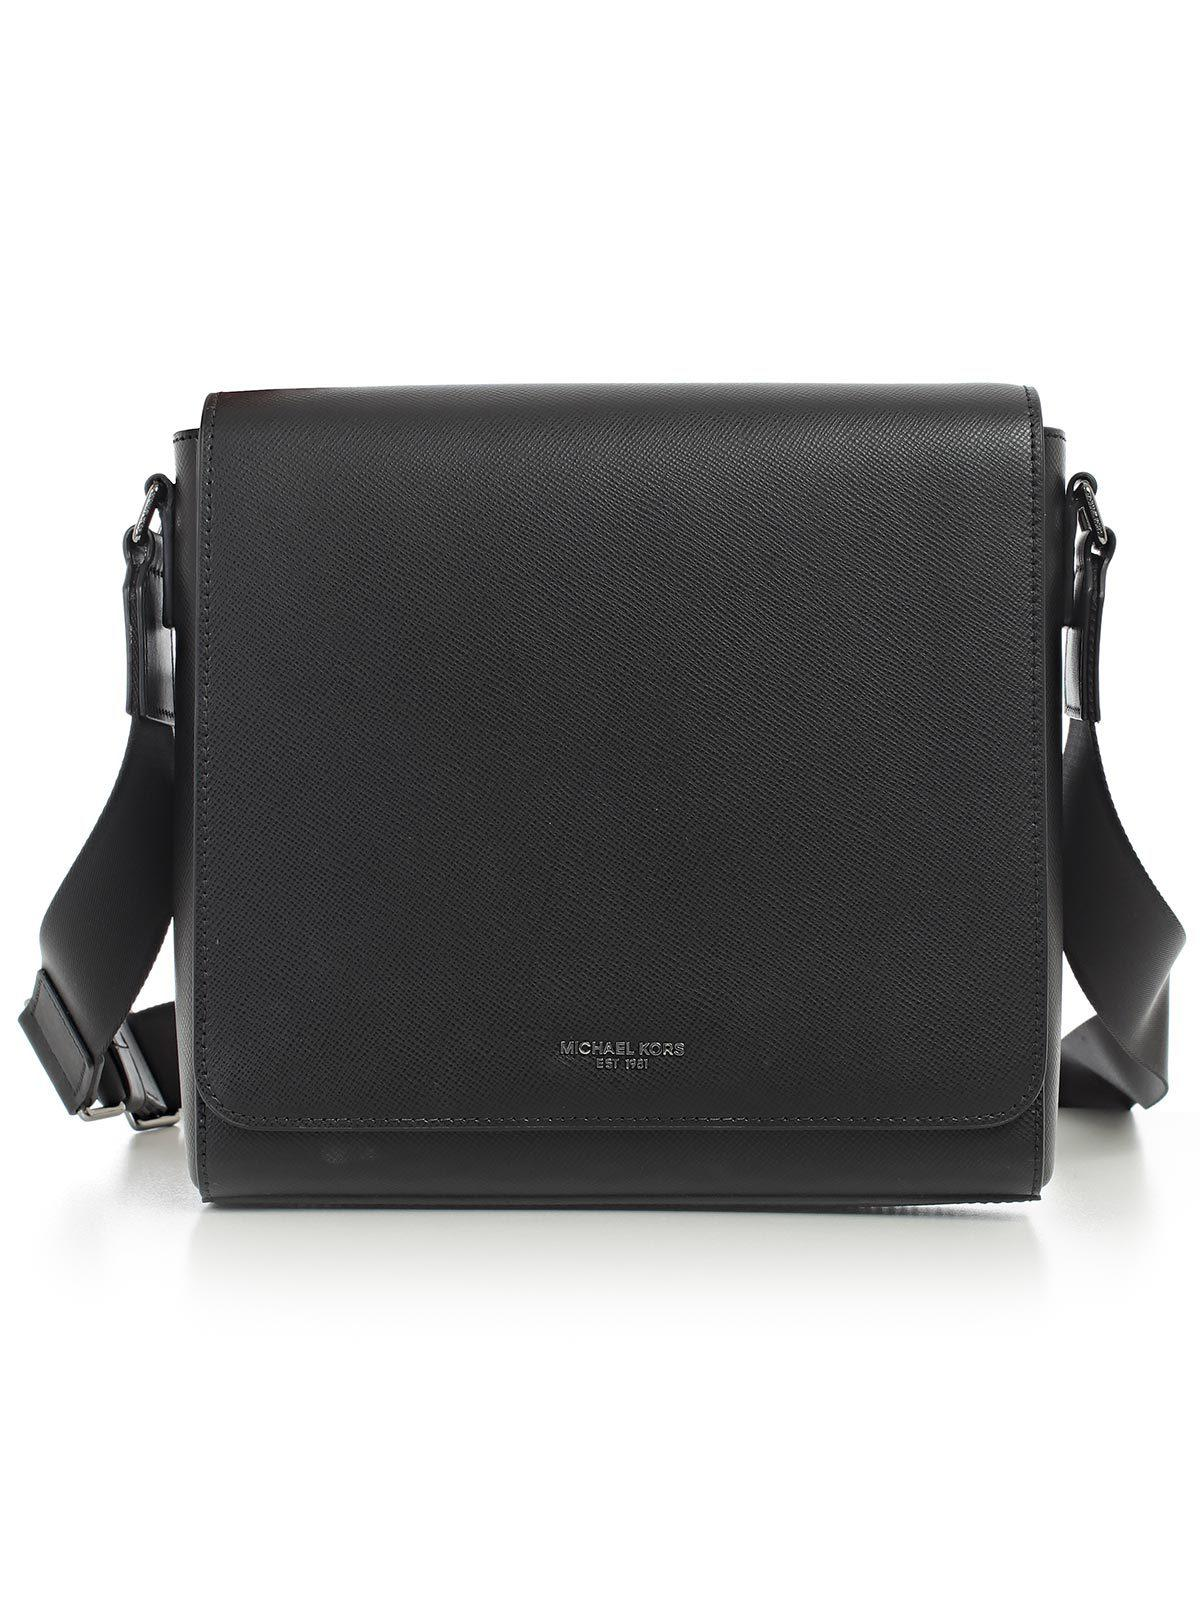 84d27c1a14c9 Lyst - Michael Kors Leather Messenger Bag in Black for Men